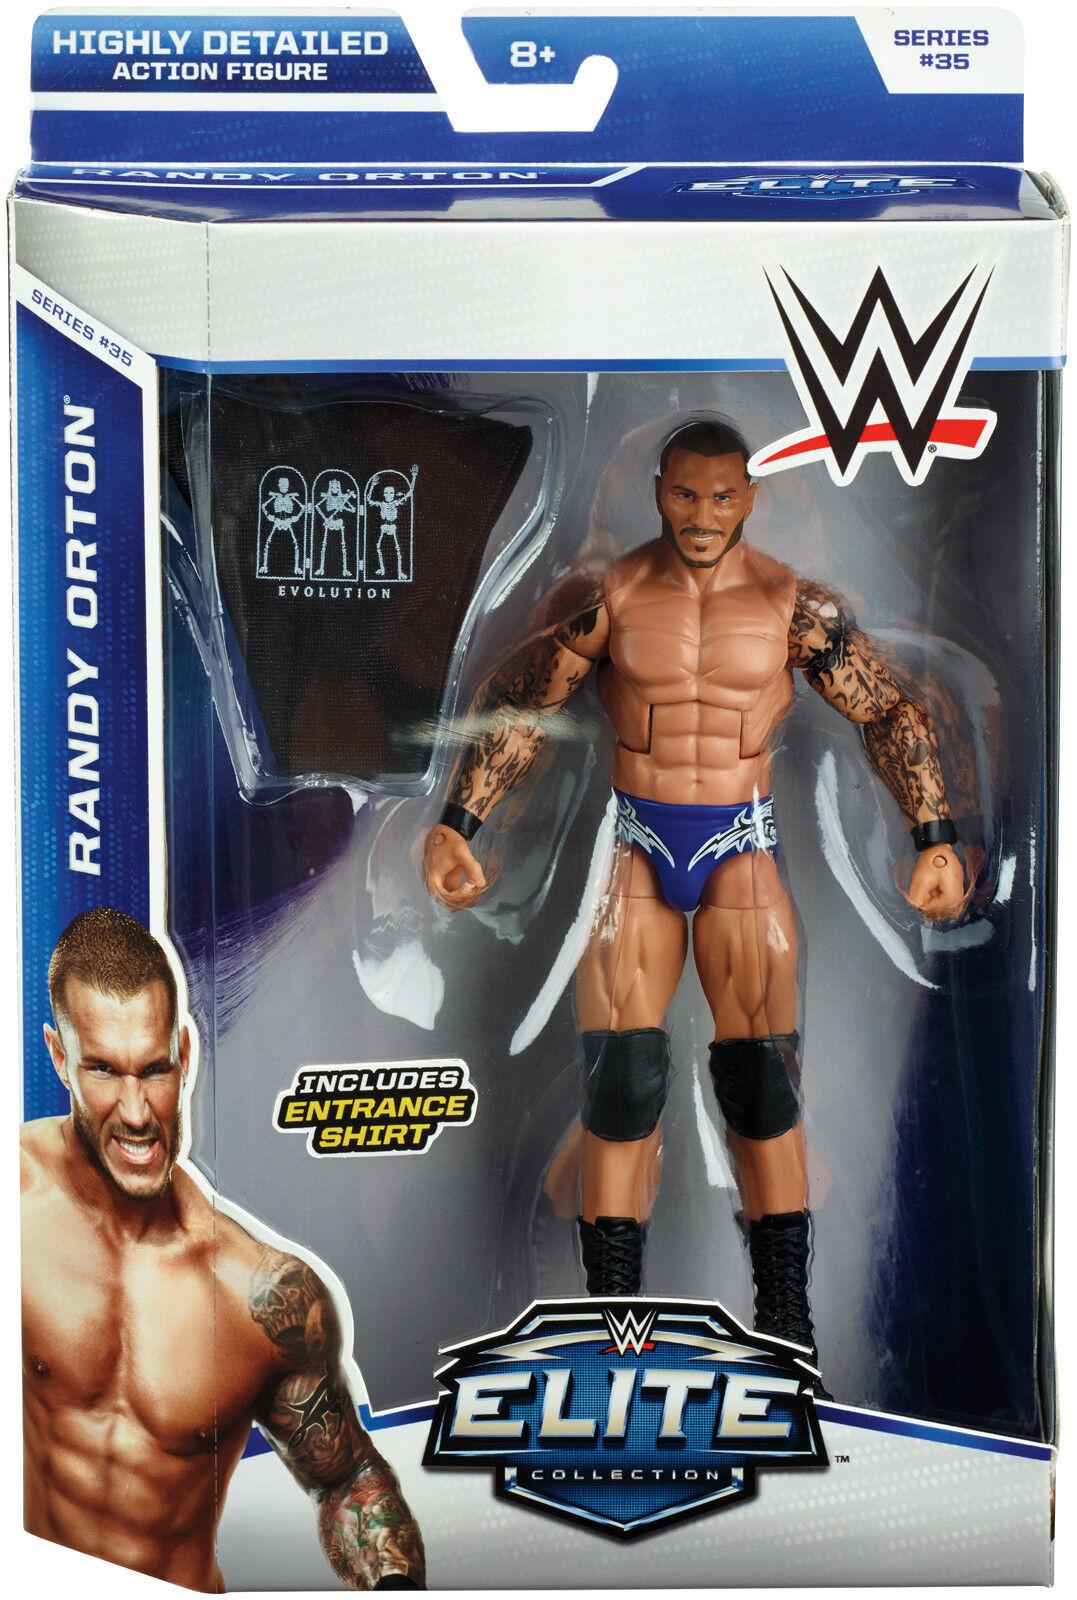 WWE RANDY ORTON FIGURE ELITE SERIES 35 WRESTLING EVOLUTION SHIRT RKO Blau SHORTS